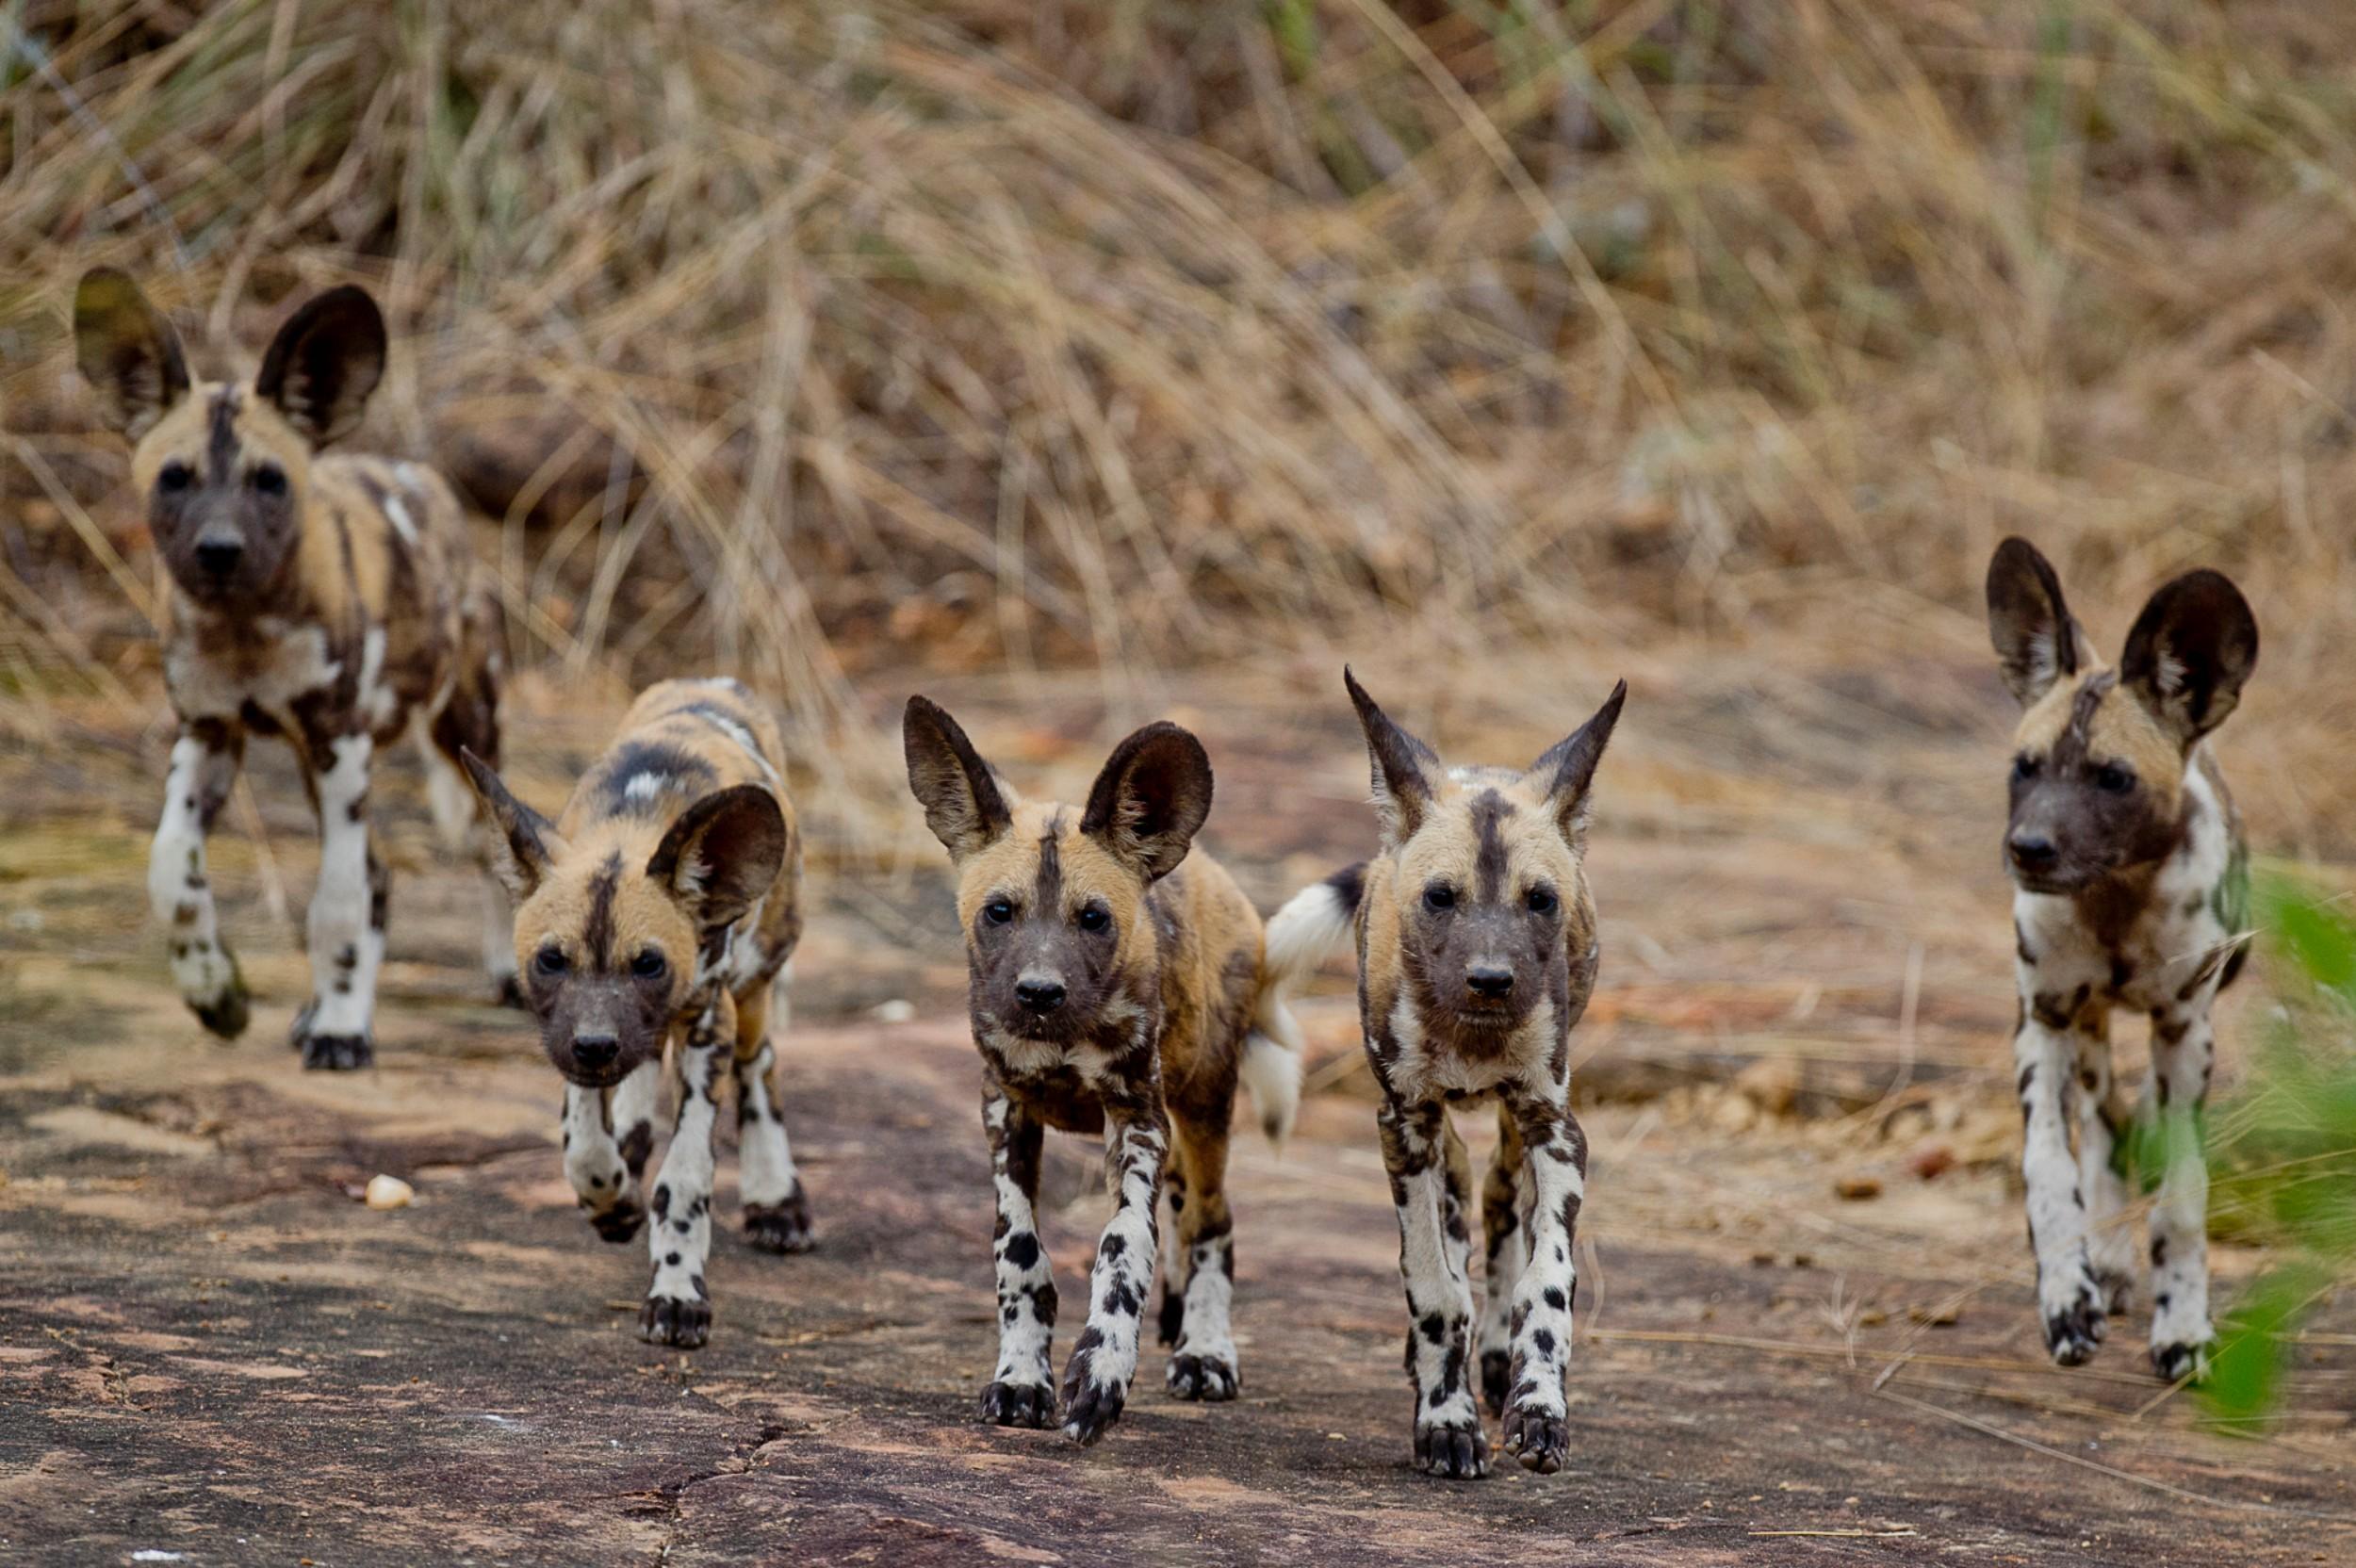 Selous-wild-dog-RR.jpg